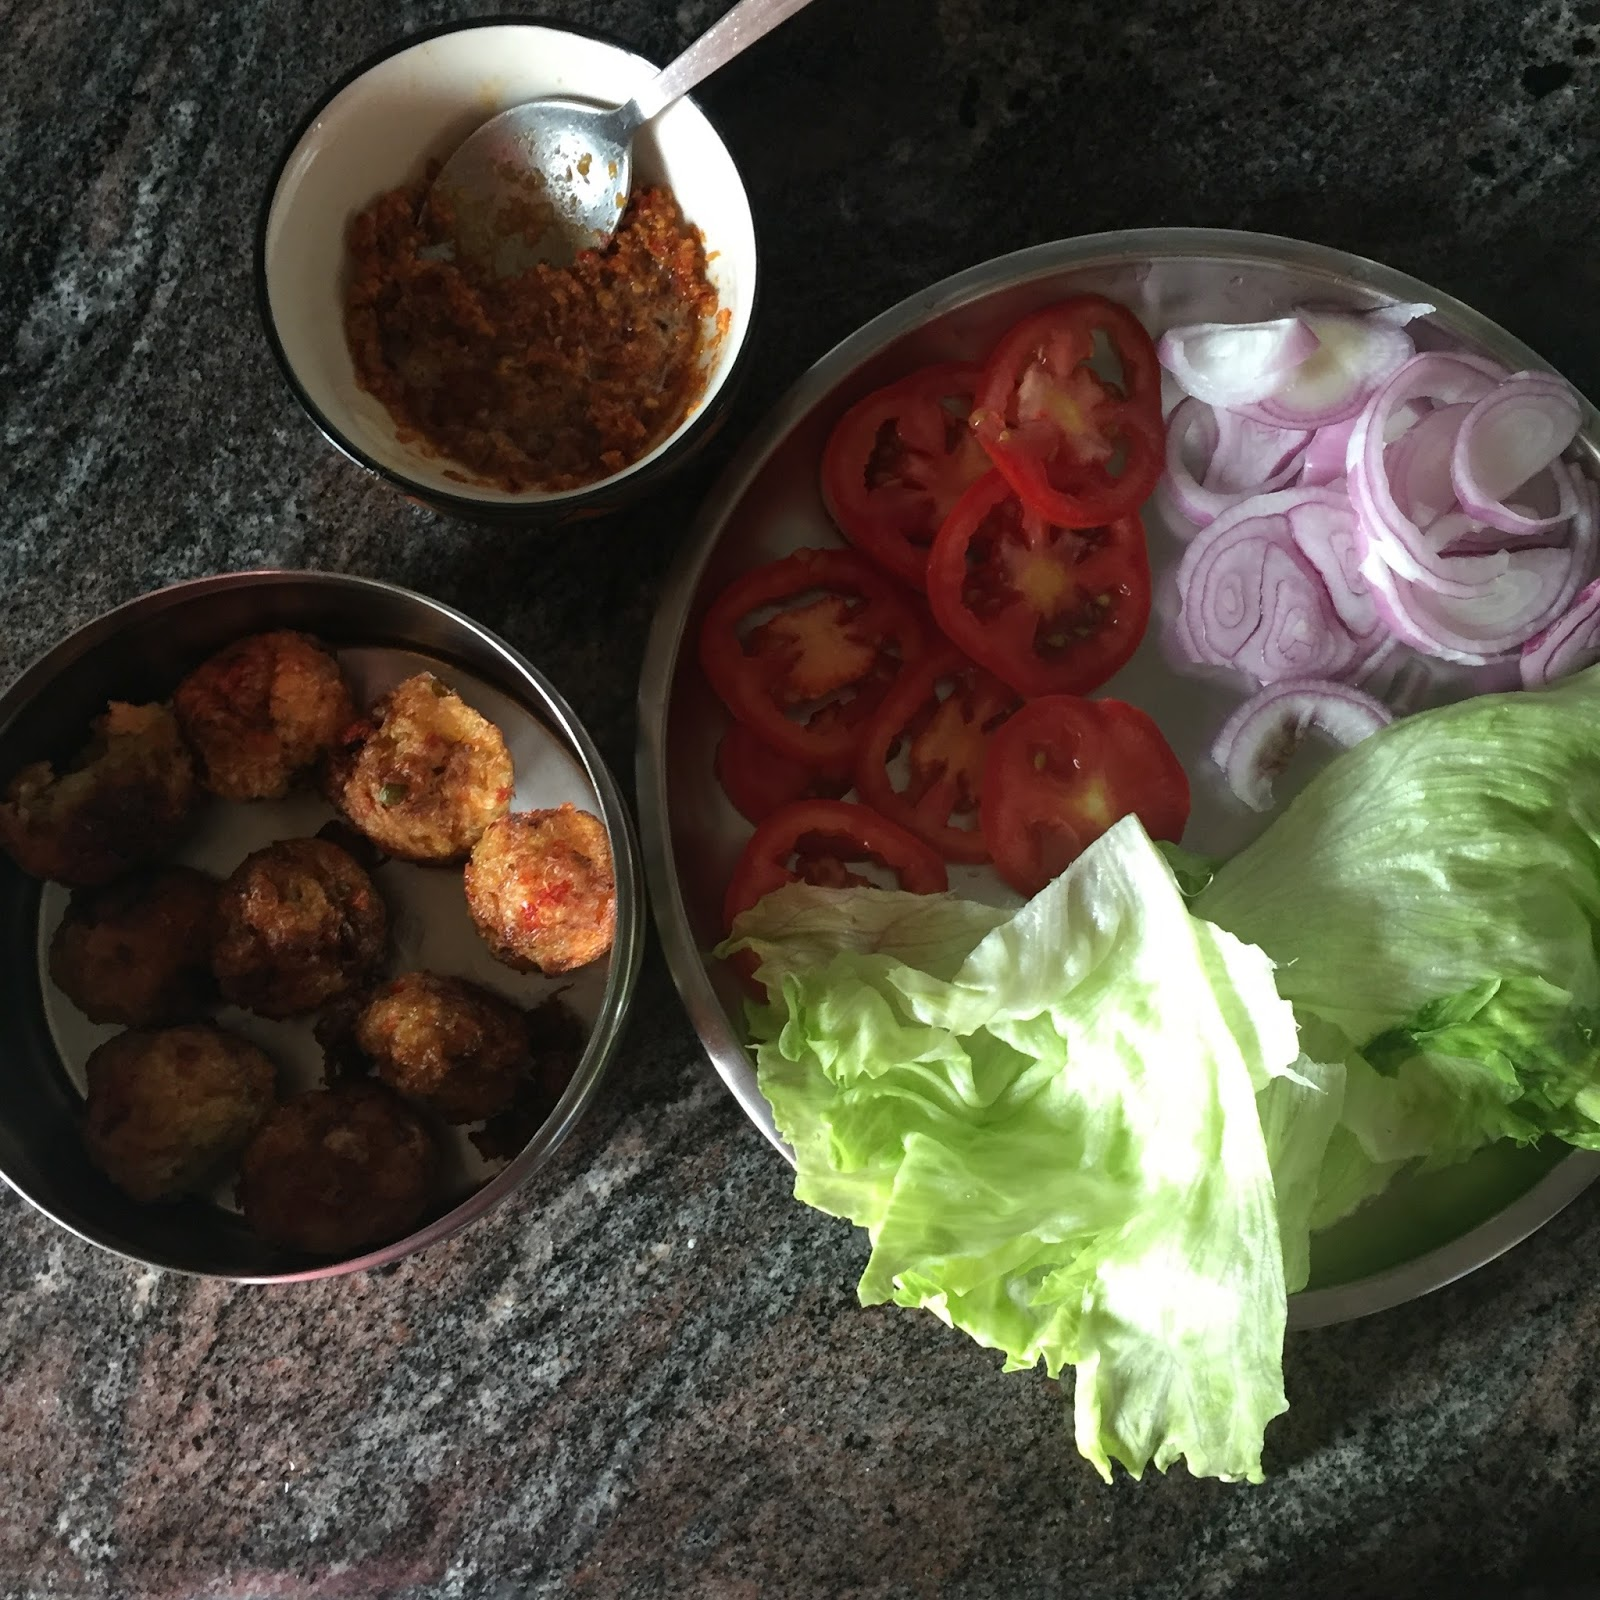 how to make veg burger at home